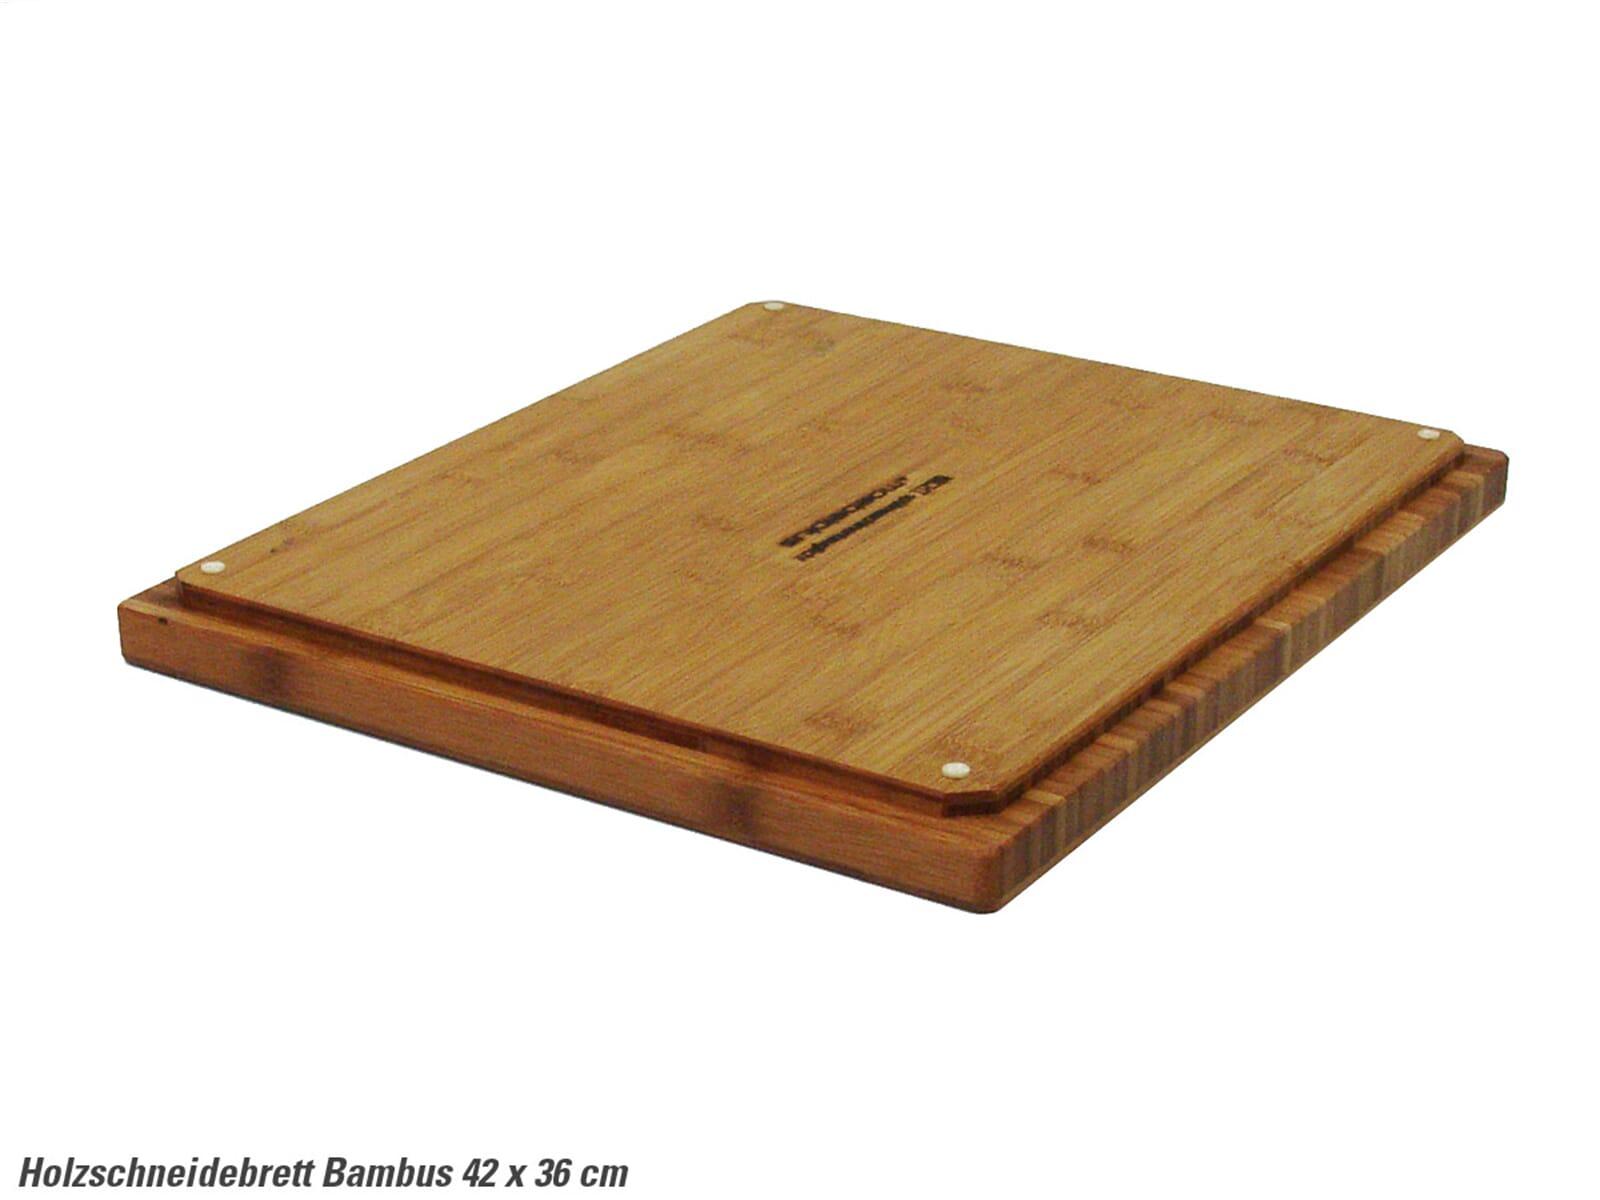 Holzschneidebrett aus Bambus